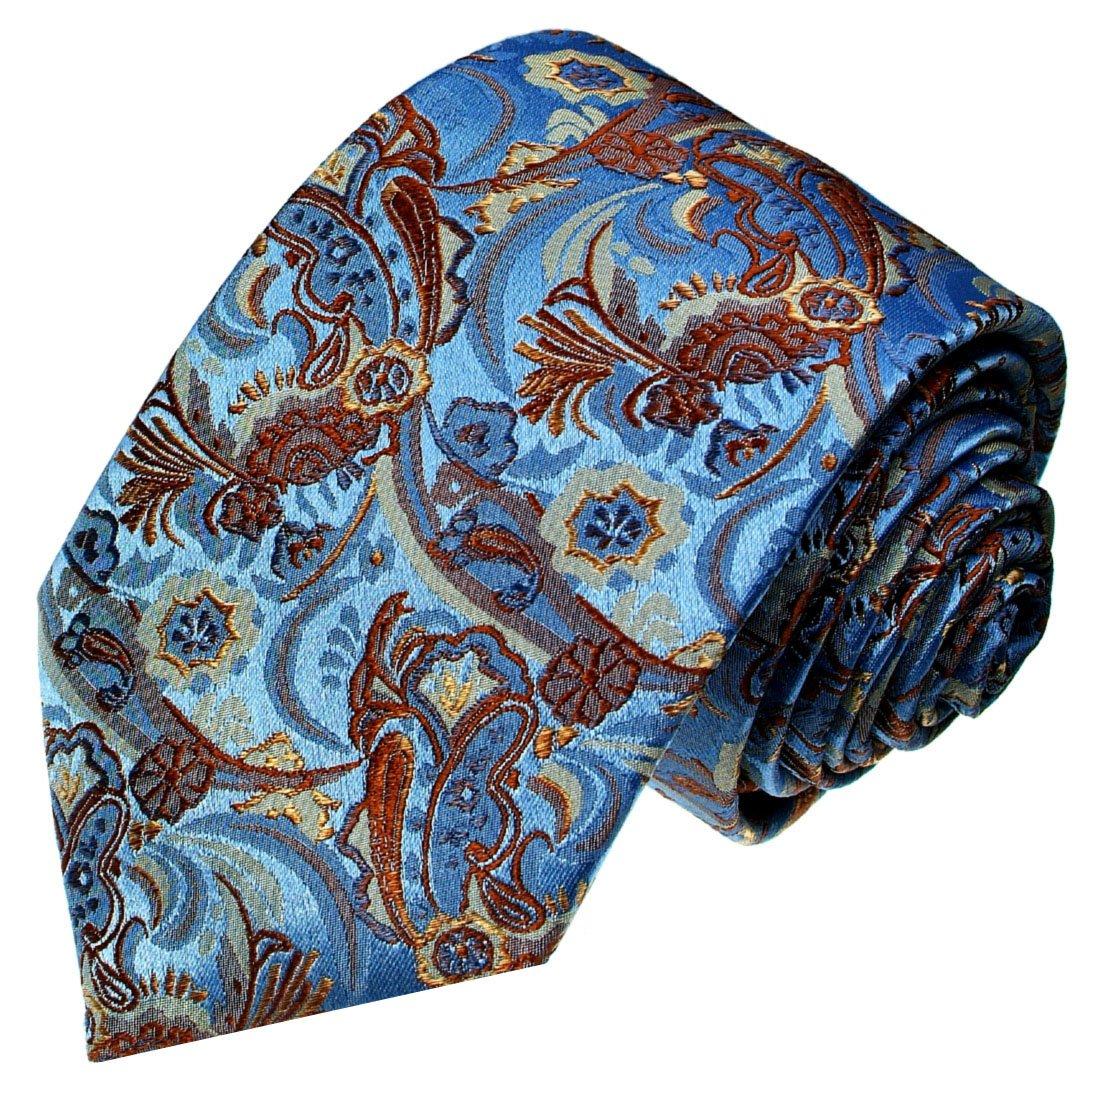 LORENZO CANA Italian Pure Silk Tie Blue Burlywood Paisley Woven Necktie 36012 by LORENZO CANA (Image #1)